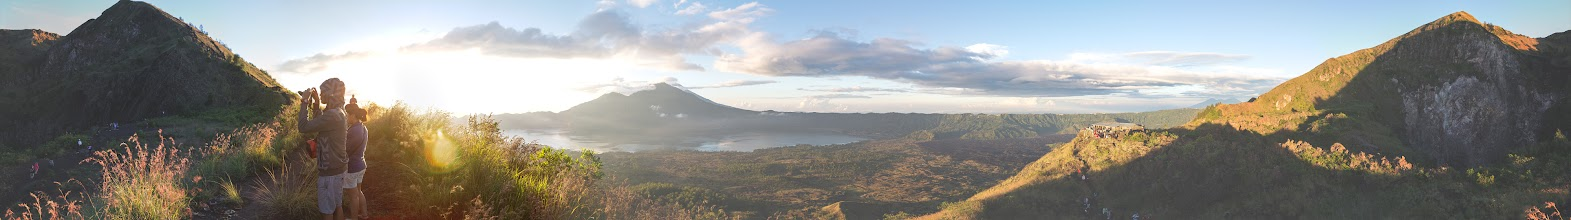 Photo: Batur volcano, Bali  For the full viewing pleasure use http://photo.harald-hoyer.de/bali.html